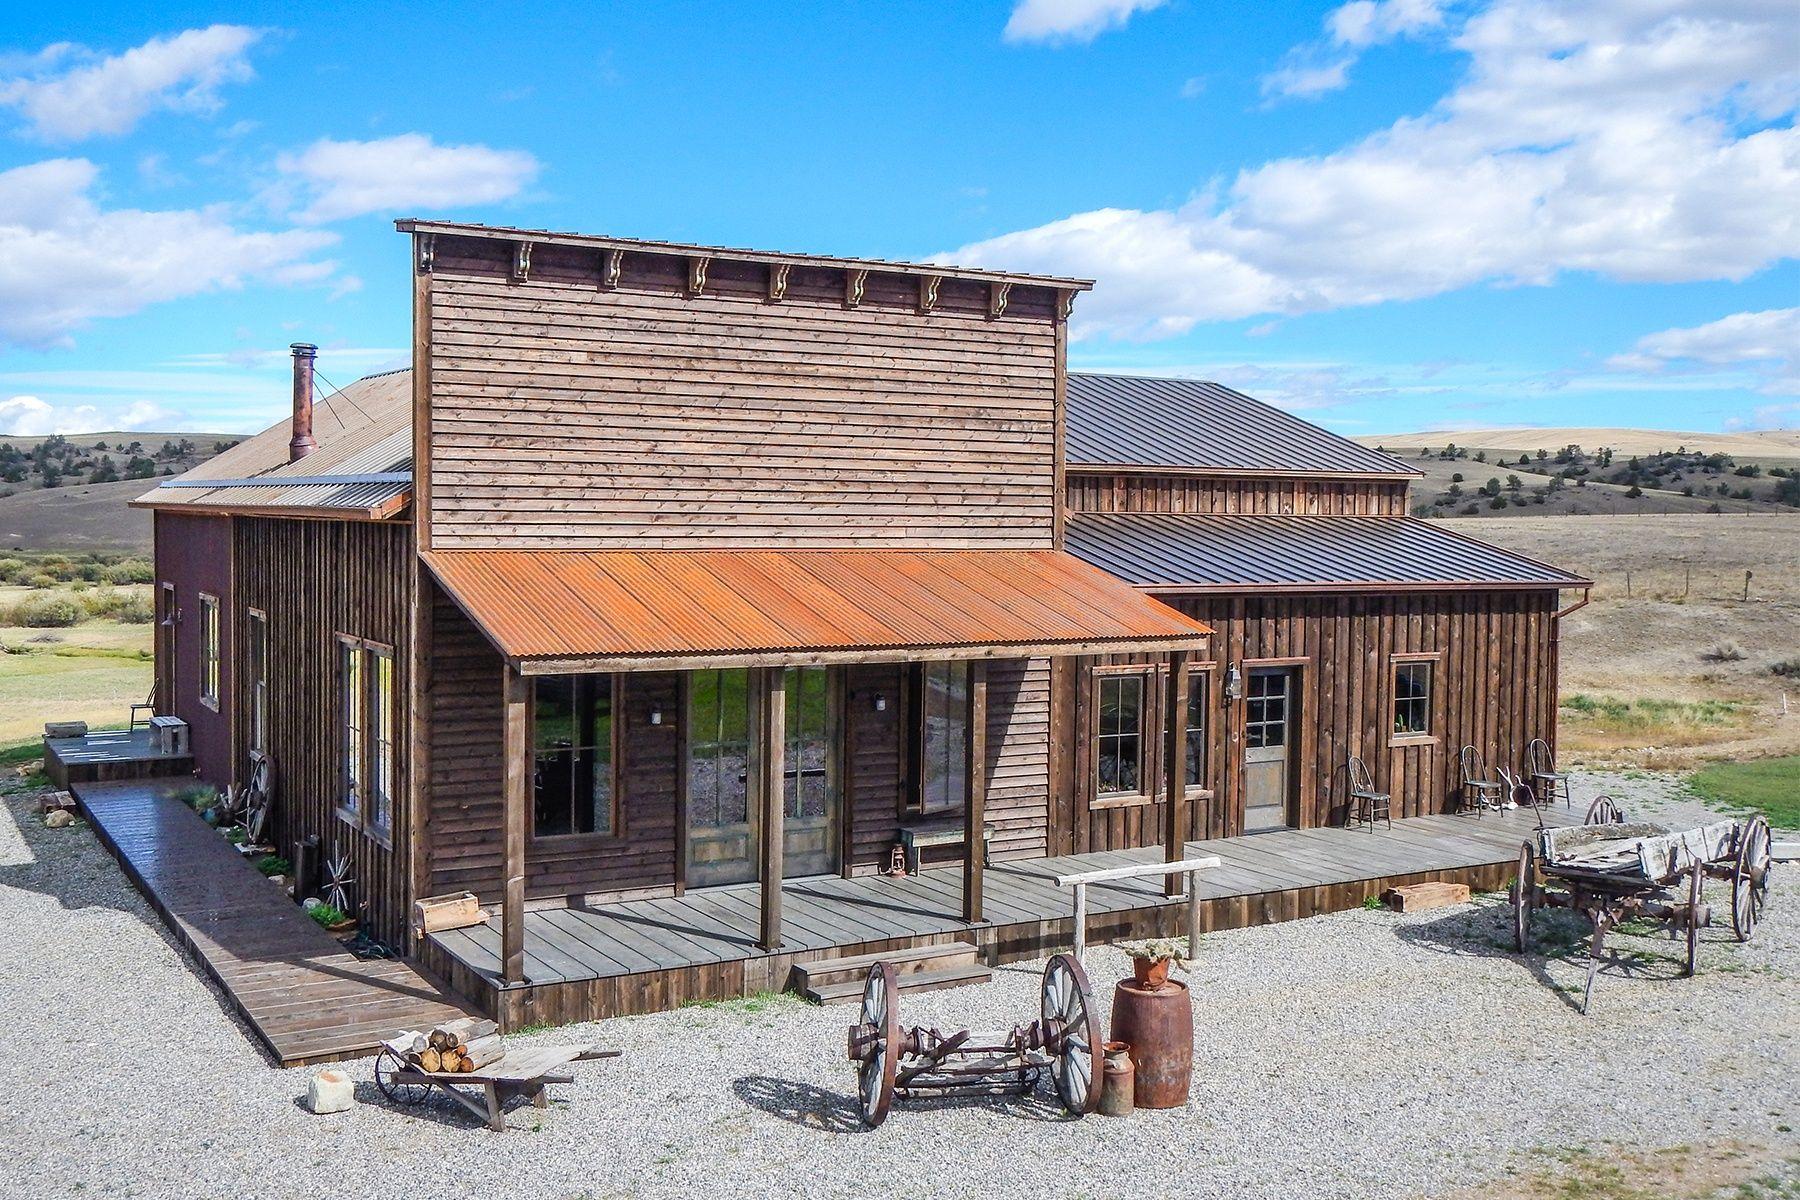 Pin By Heather Zielinski On Shopdominium Corrugated Metal Siding Metal Roof Corrugated Metal Roof